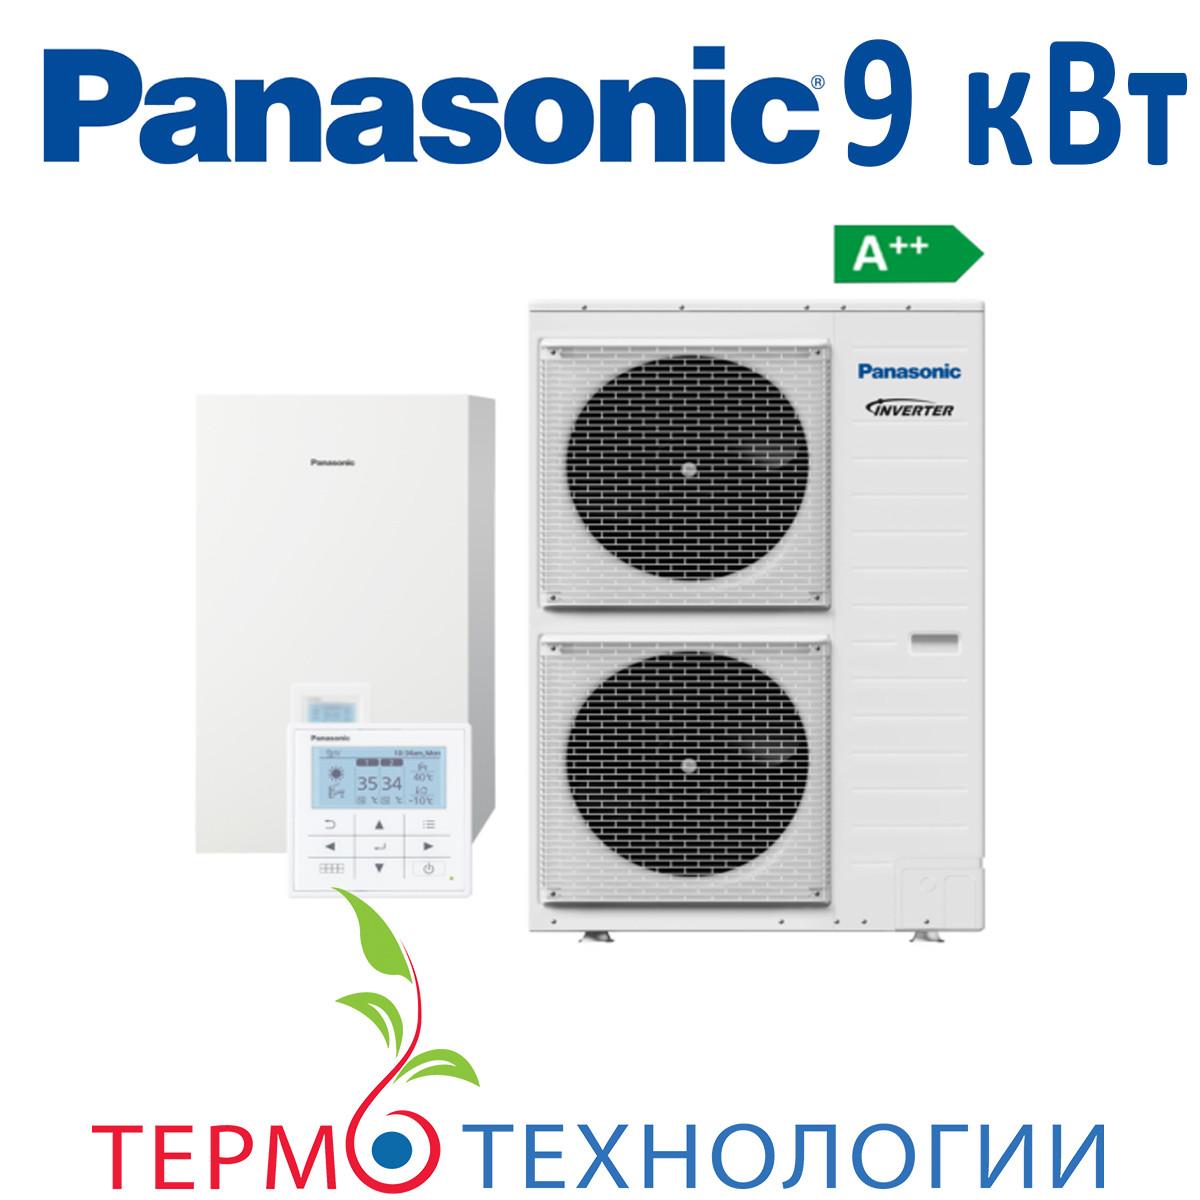 Тепловой насос воздух-вода Panasonic 9 кВт, T-CAP с гидромодулем